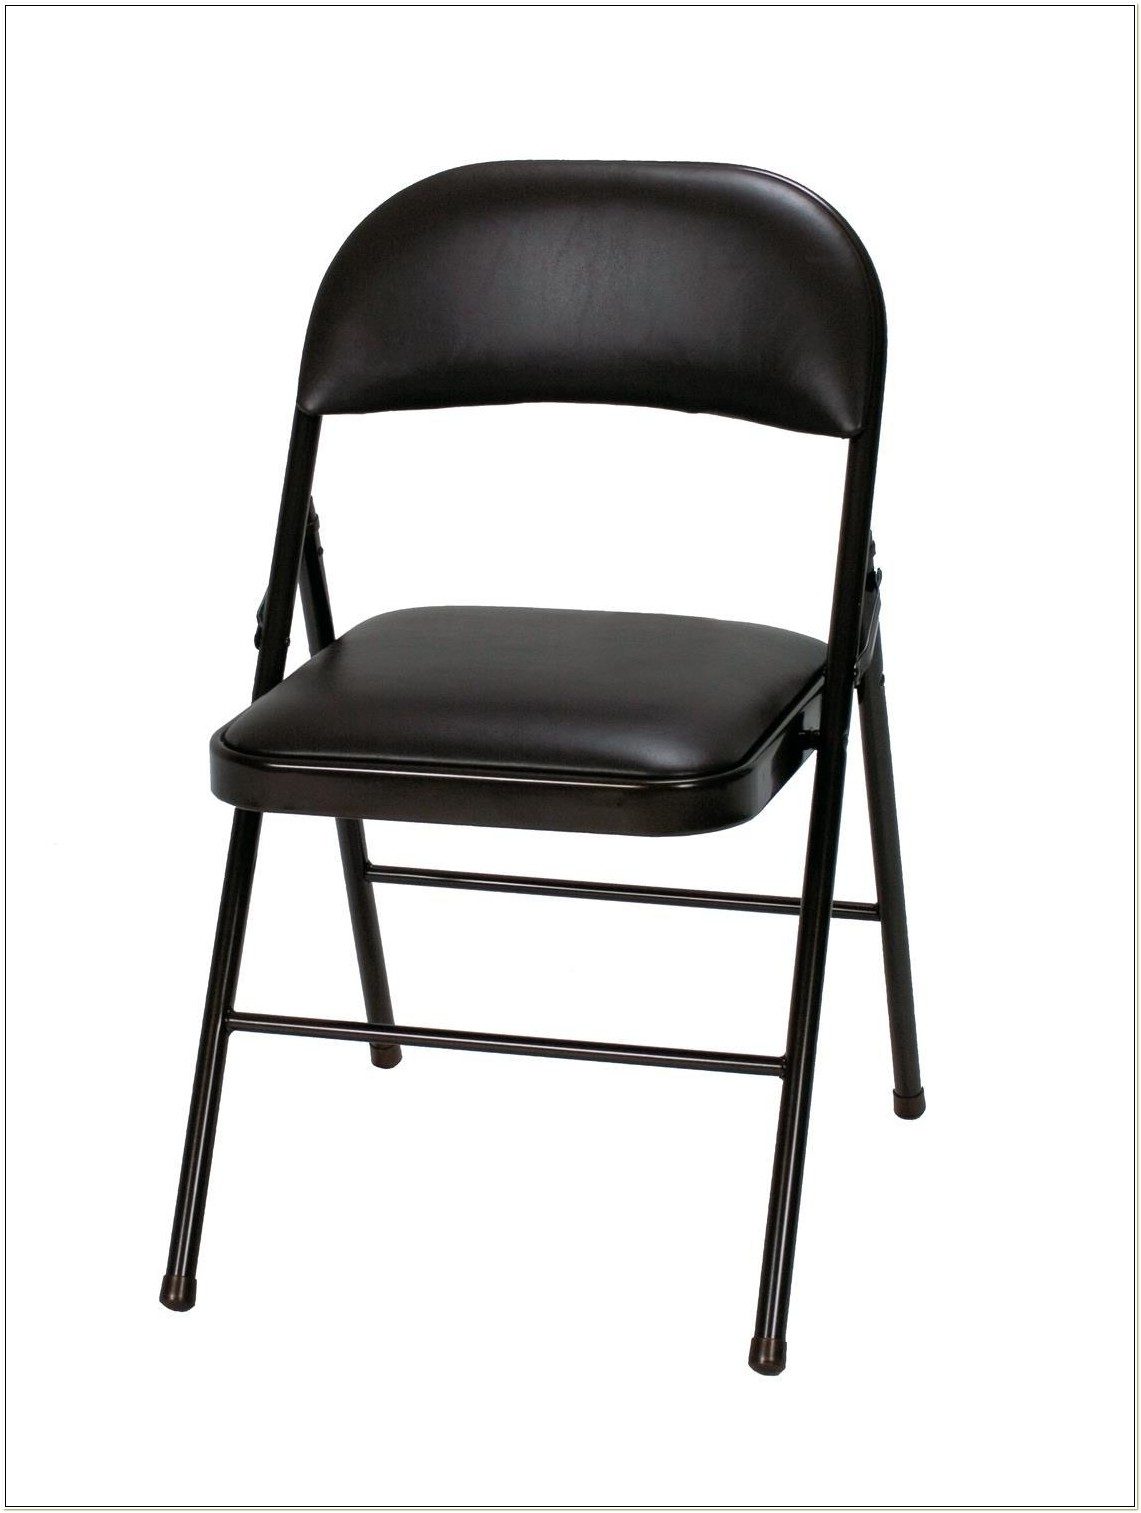 Cosco Folding Comfort Chairs Black